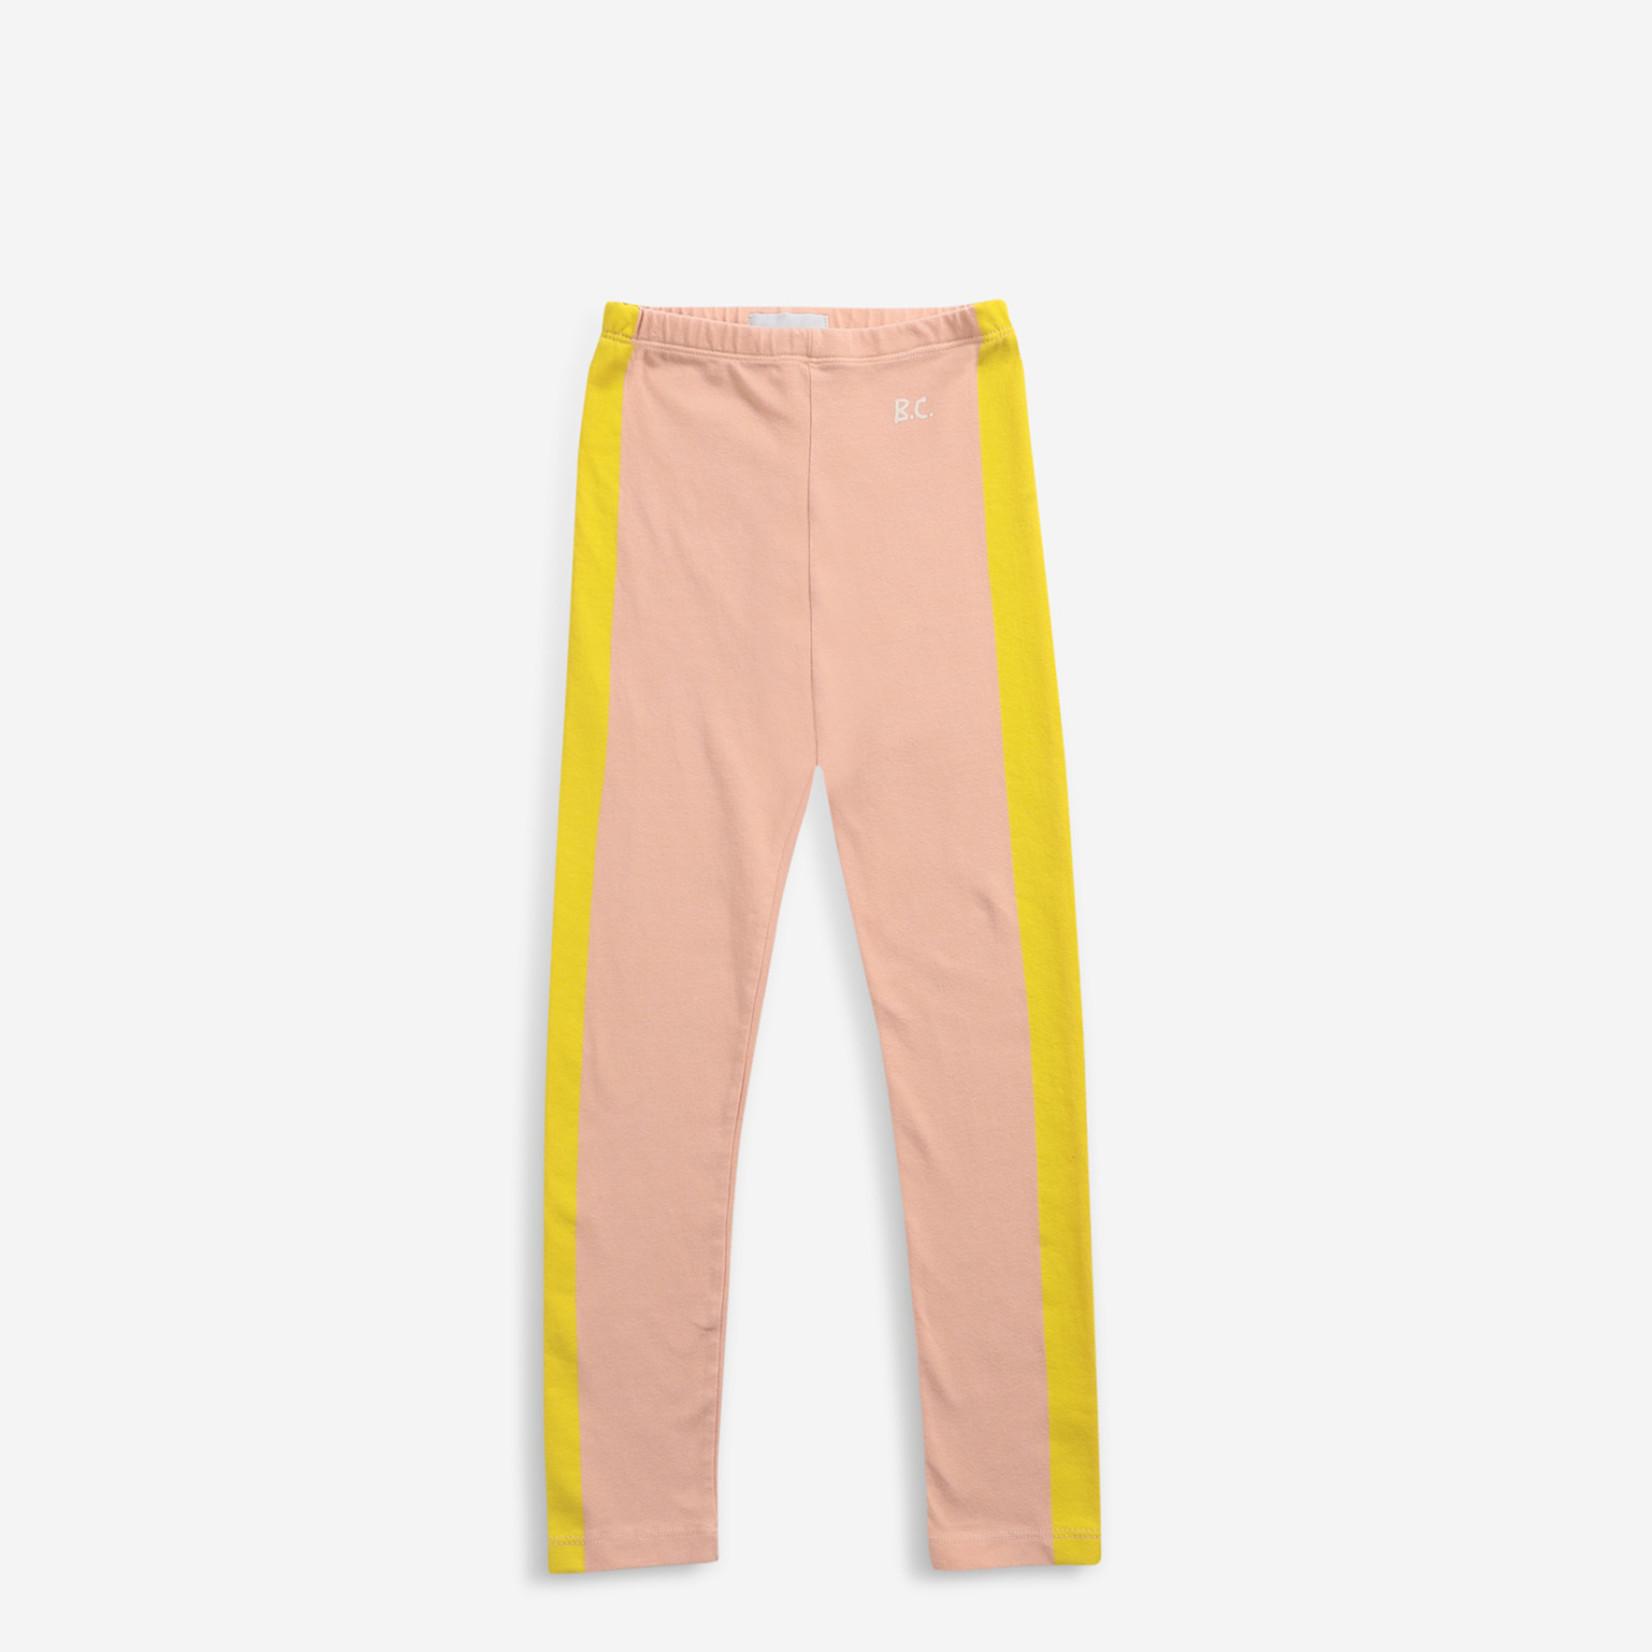 BOBO CHOSES BOBO CHOSES Yellow Stripes legging